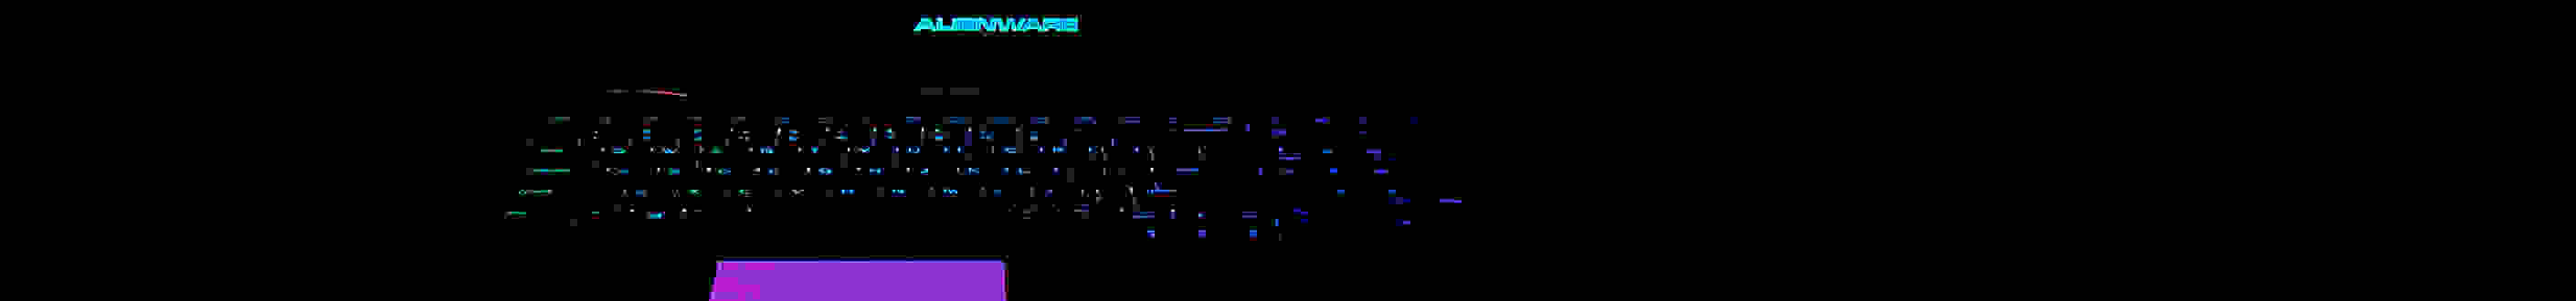 The Alienware 17 Gaming Laptop (Radeon R9 M290X Version)